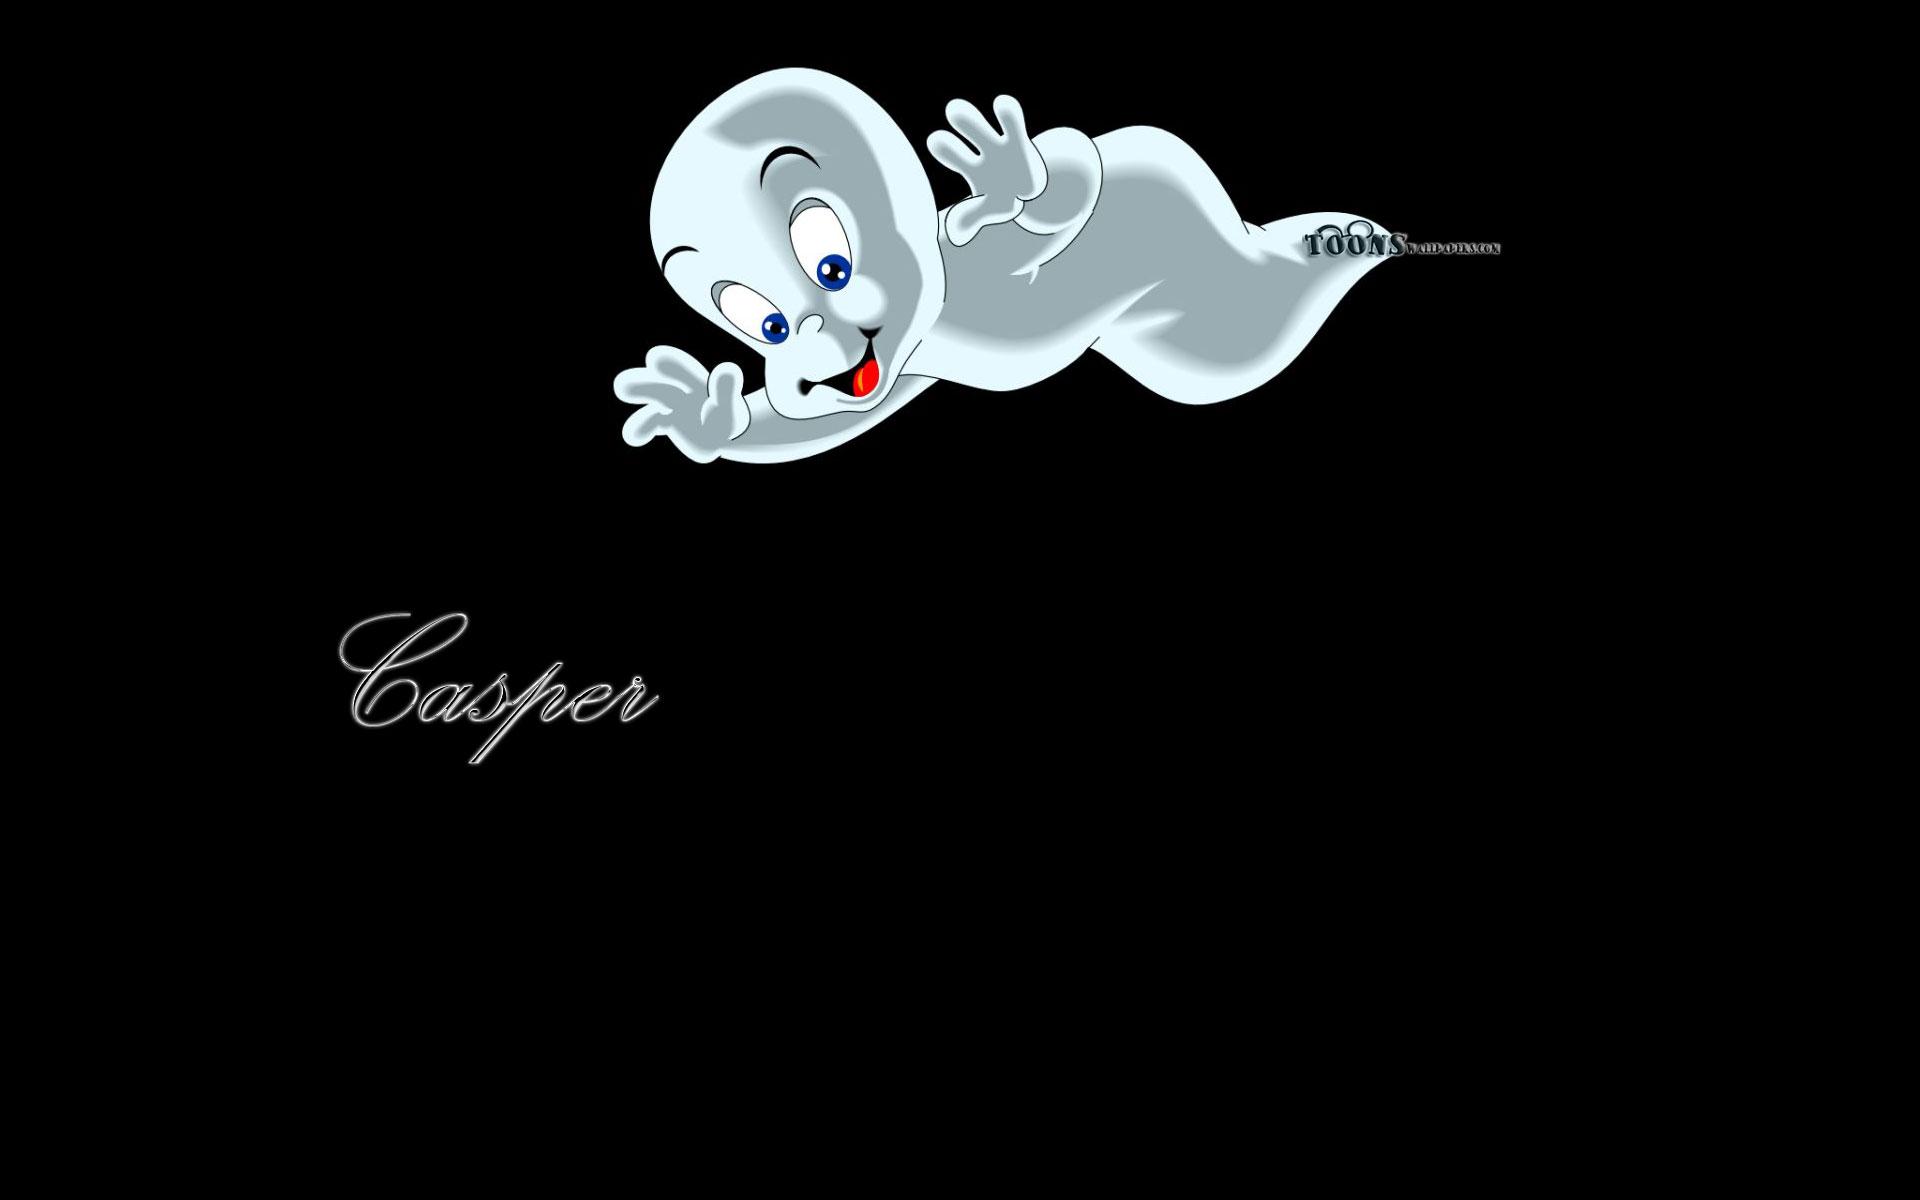 Cute Ghost Wallpaper Wallpaper info download 1920x1200